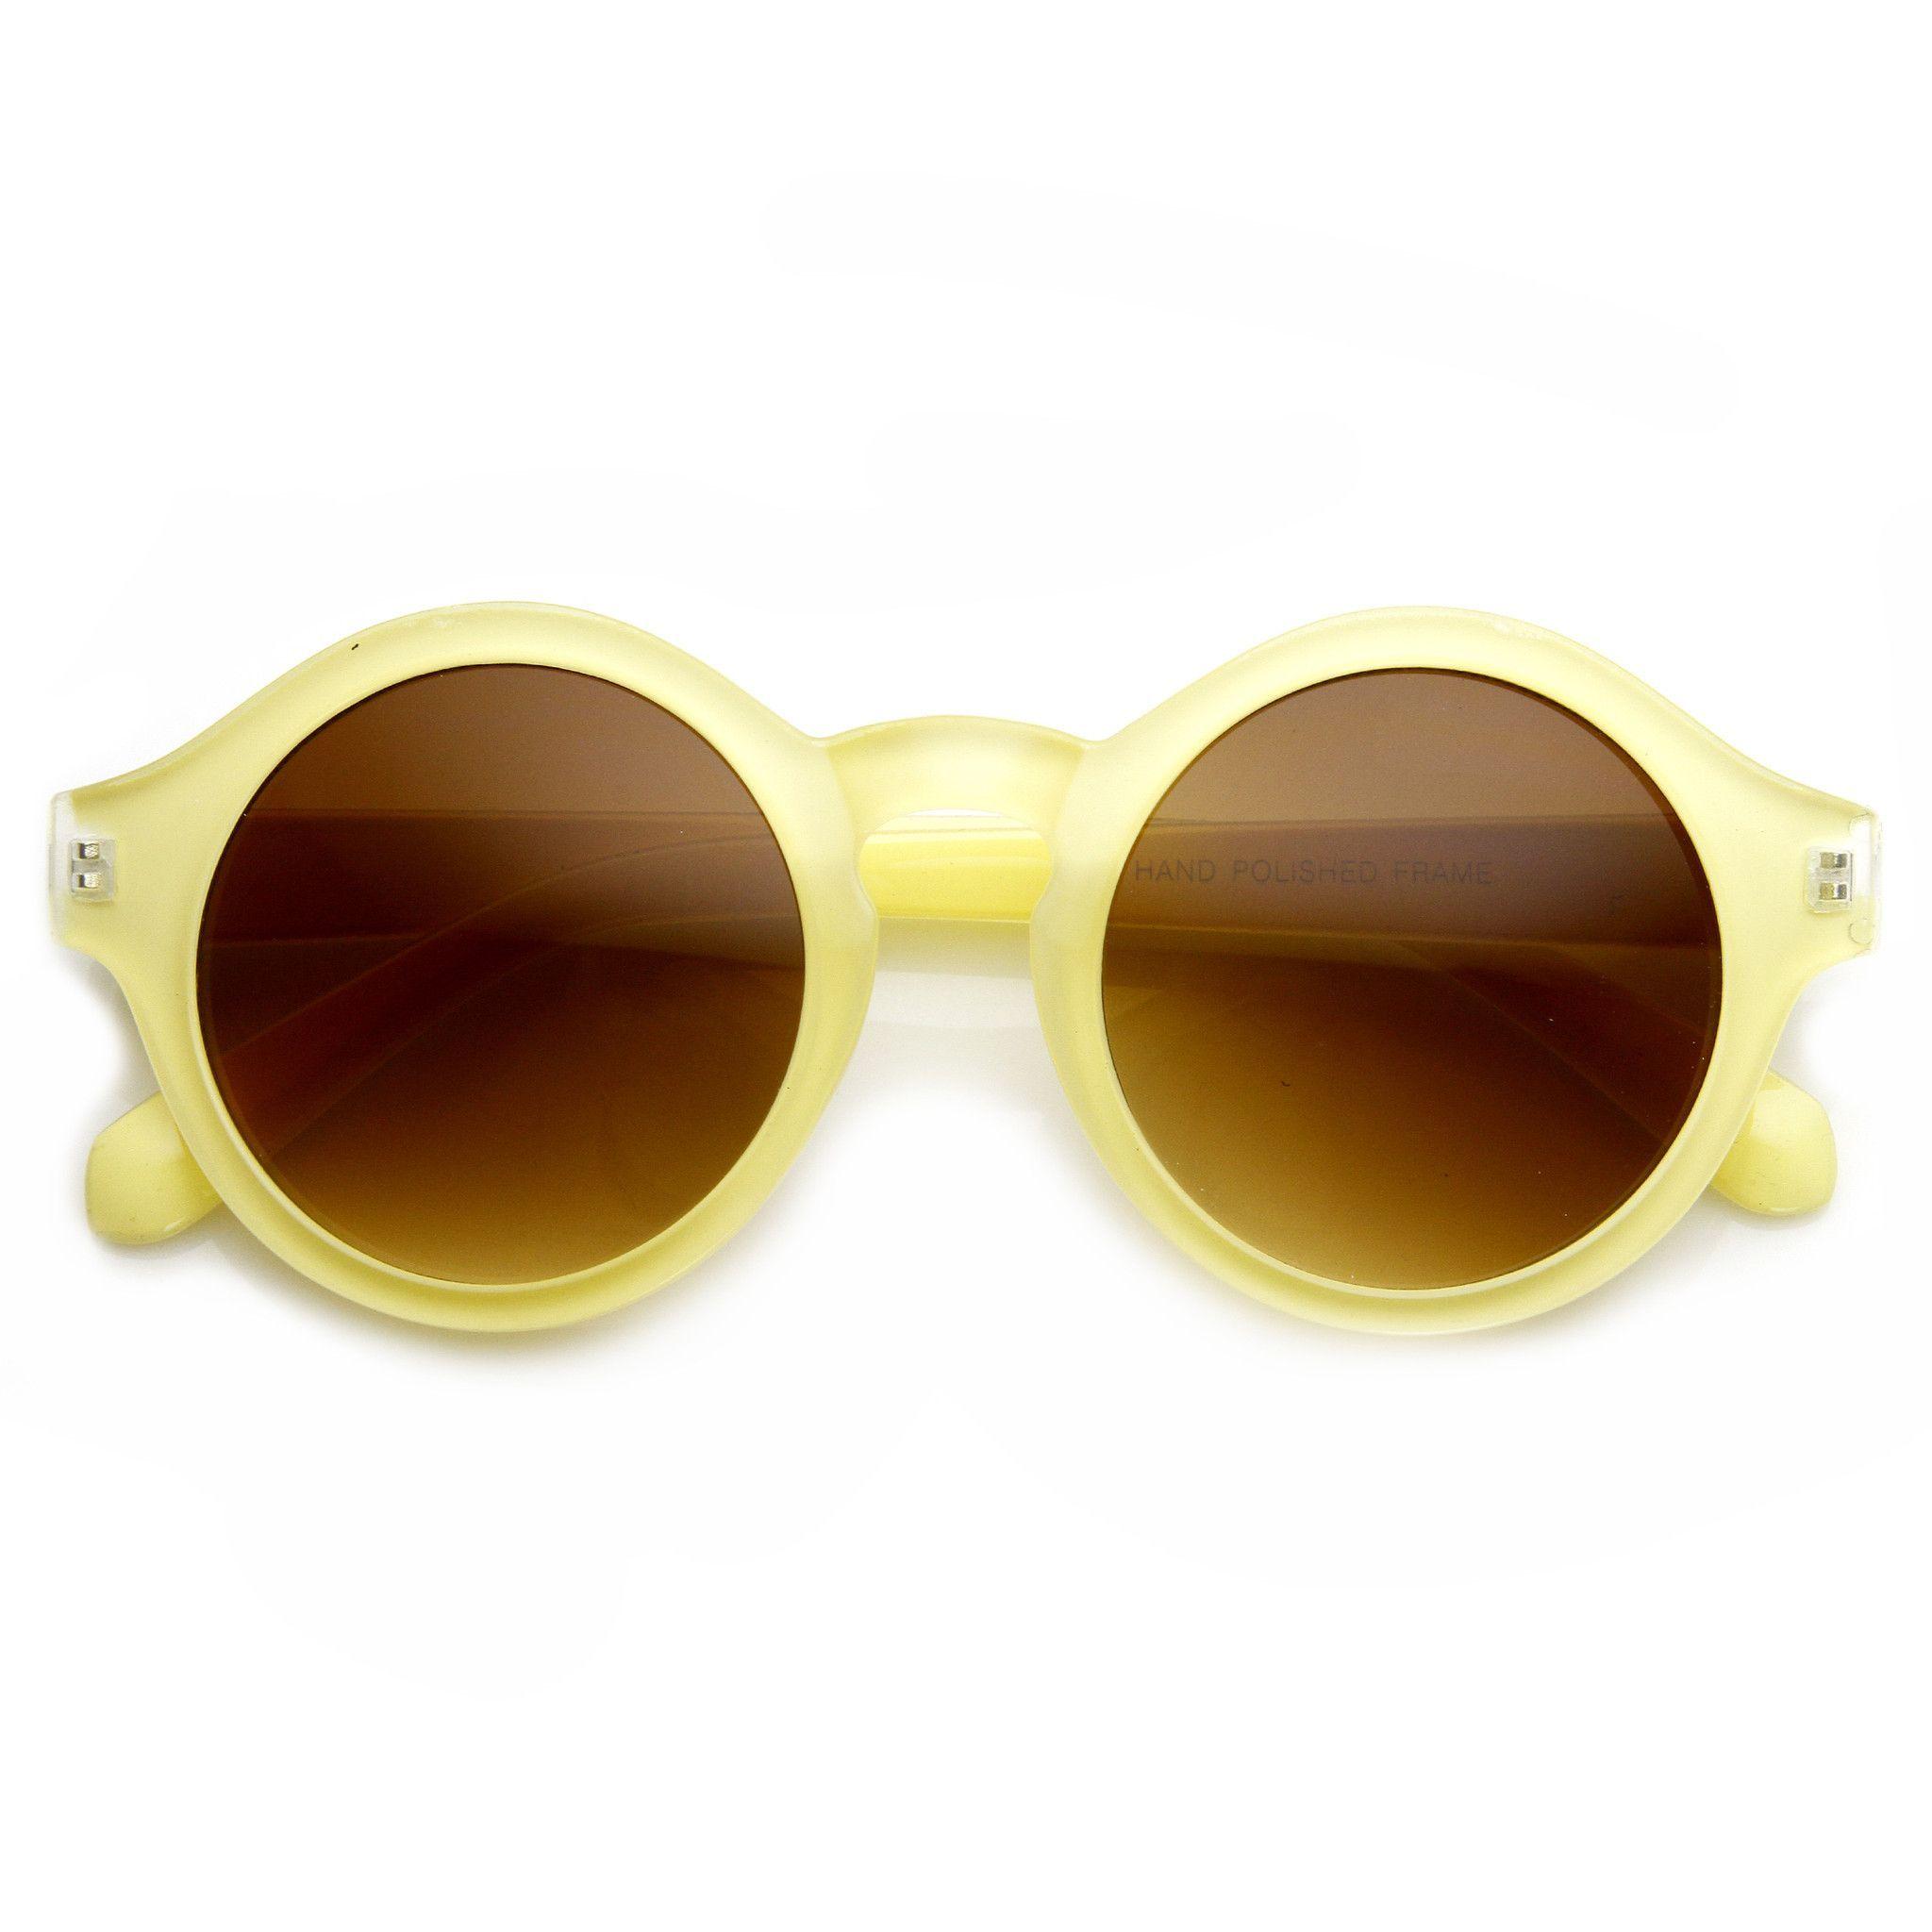 Classic Retro Keyhole Round P3 Frame Sunglasses 9196 | Pinterest